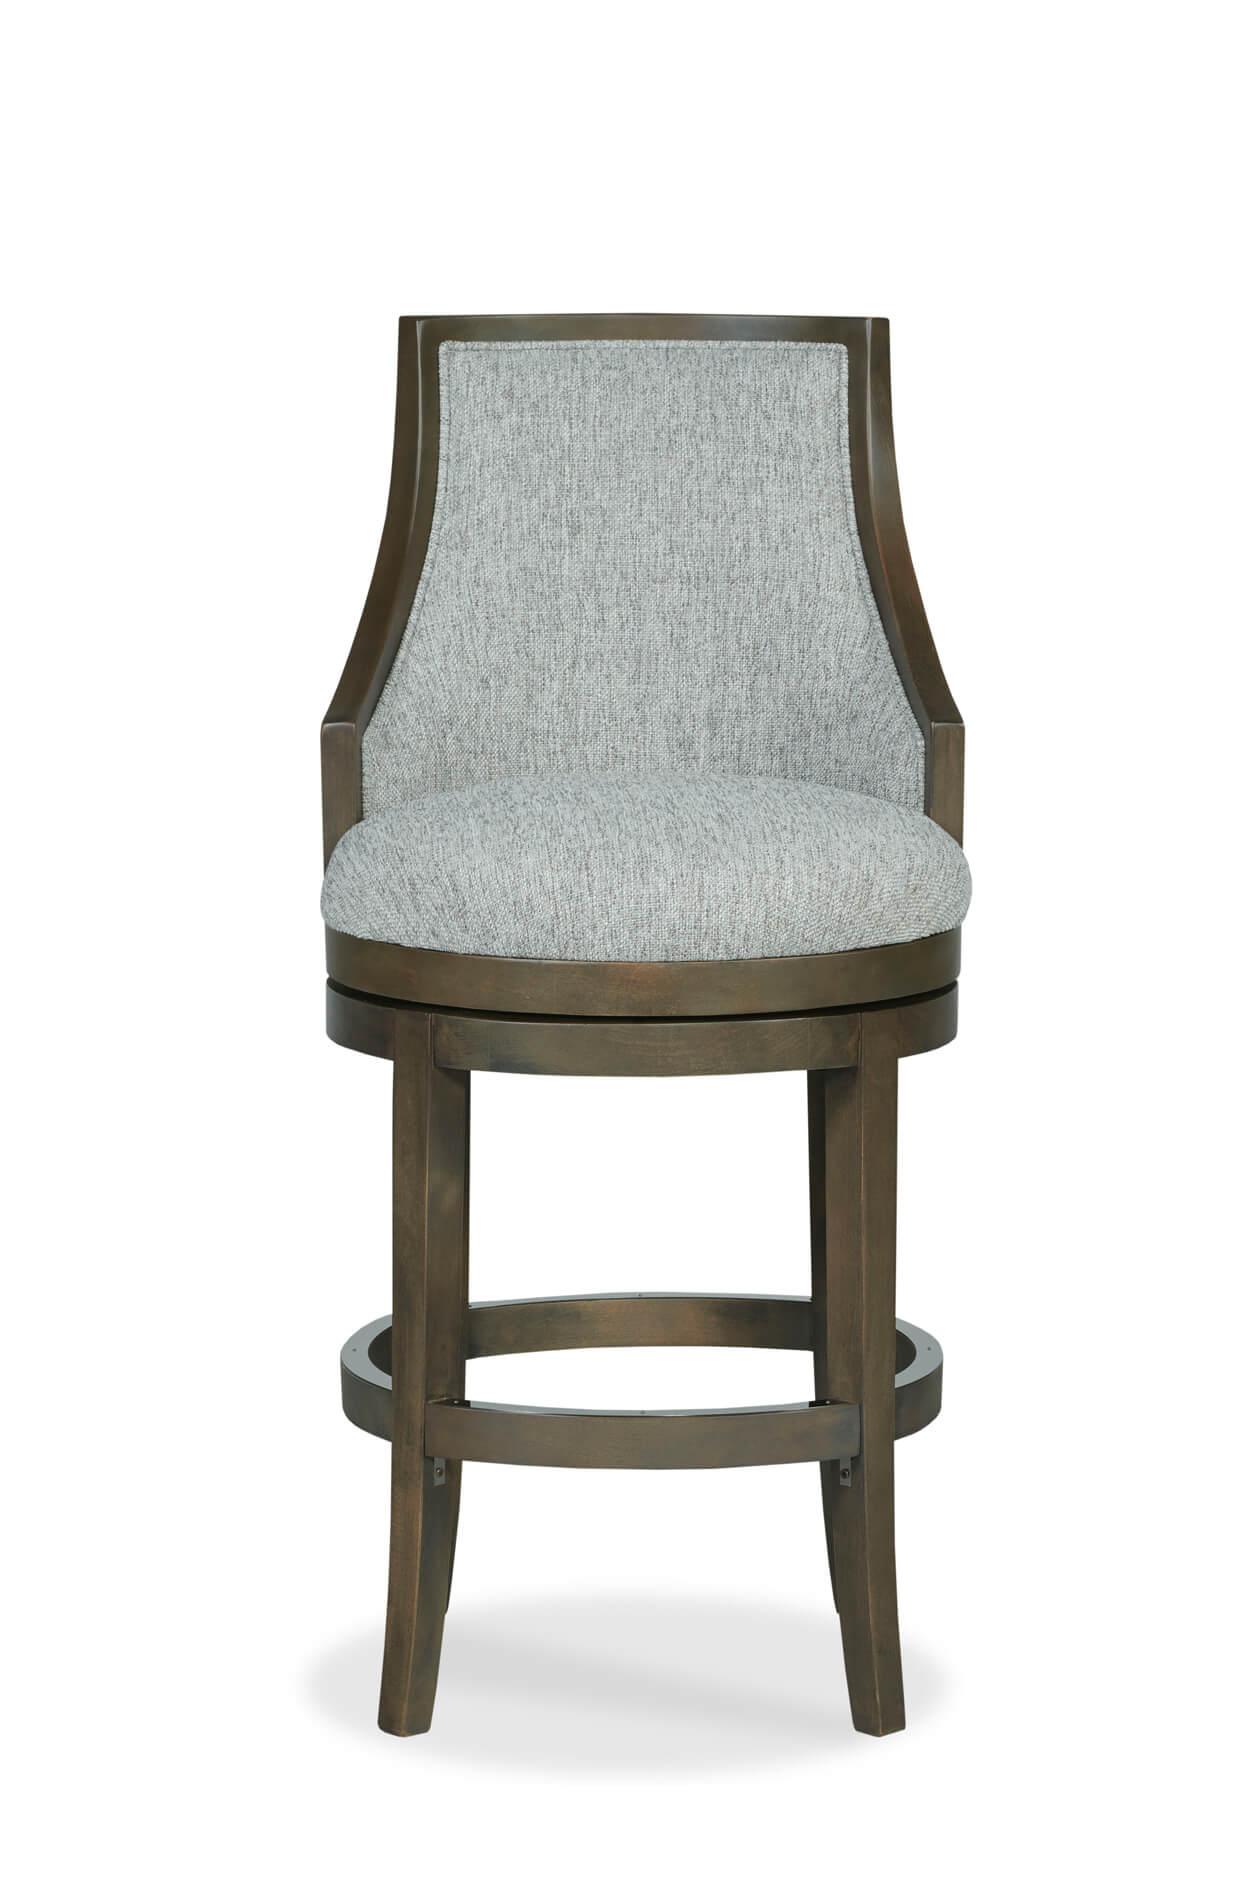 Awe Inspiring Robroy Upholstered Wooden Swivel Stool With Back Ibusinesslaw Wood Chair Design Ideas Ibusinesslaworg